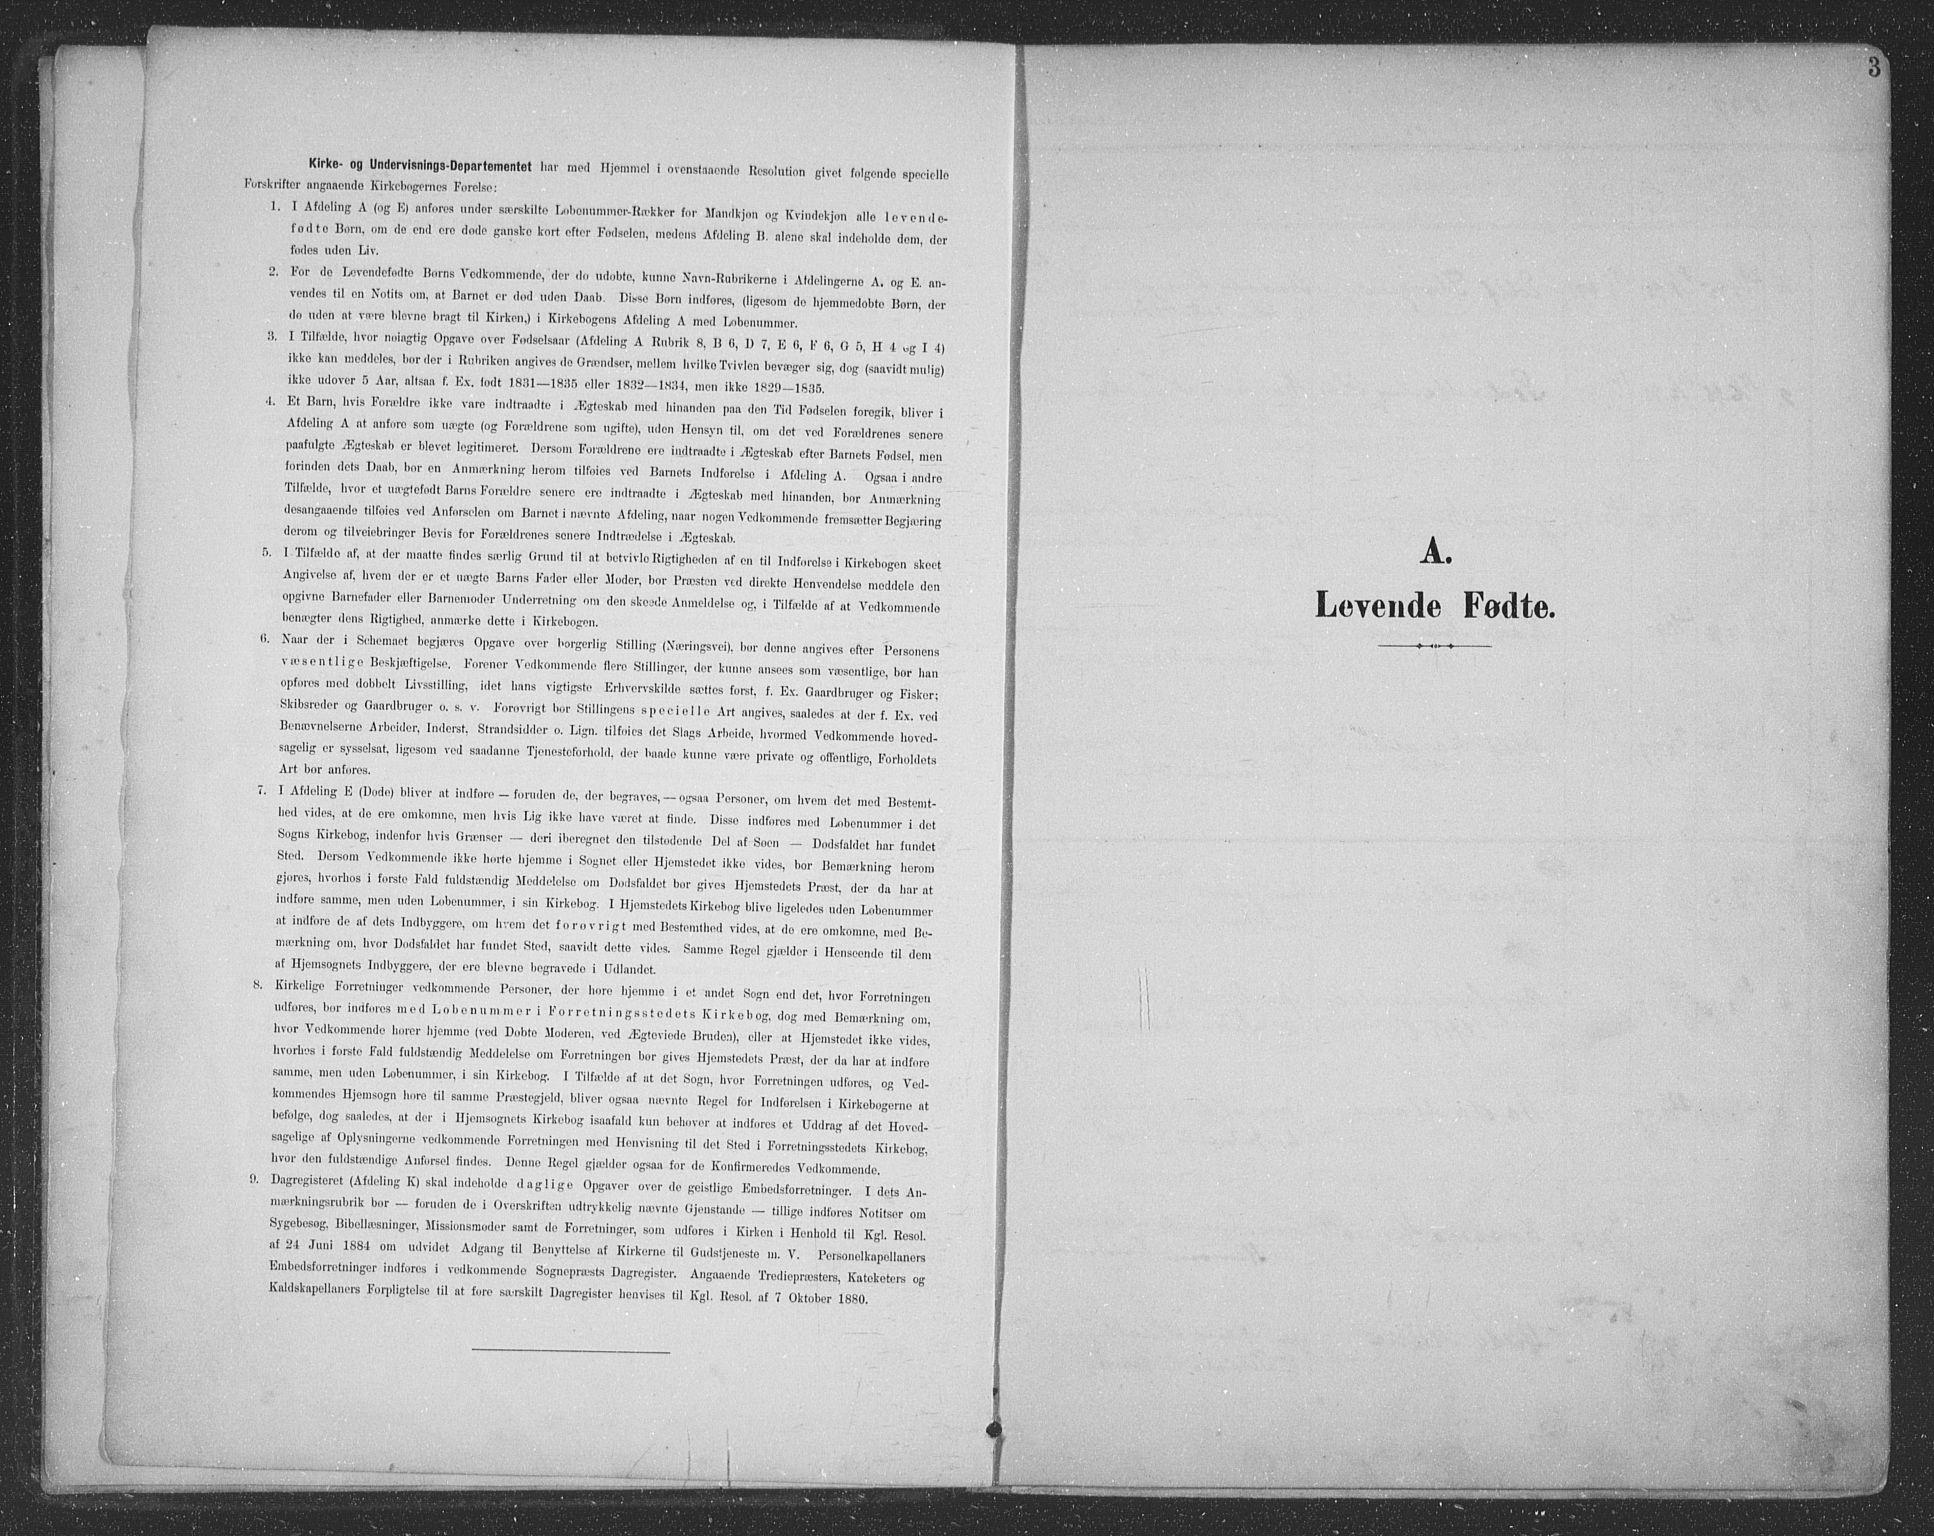 SAT, Ministerialprotokoller, klokkerbøker og fødselsregistre - Nordland, 863/L0899: Ministerialbok nr. 863A11, 1897-1906, s. 3